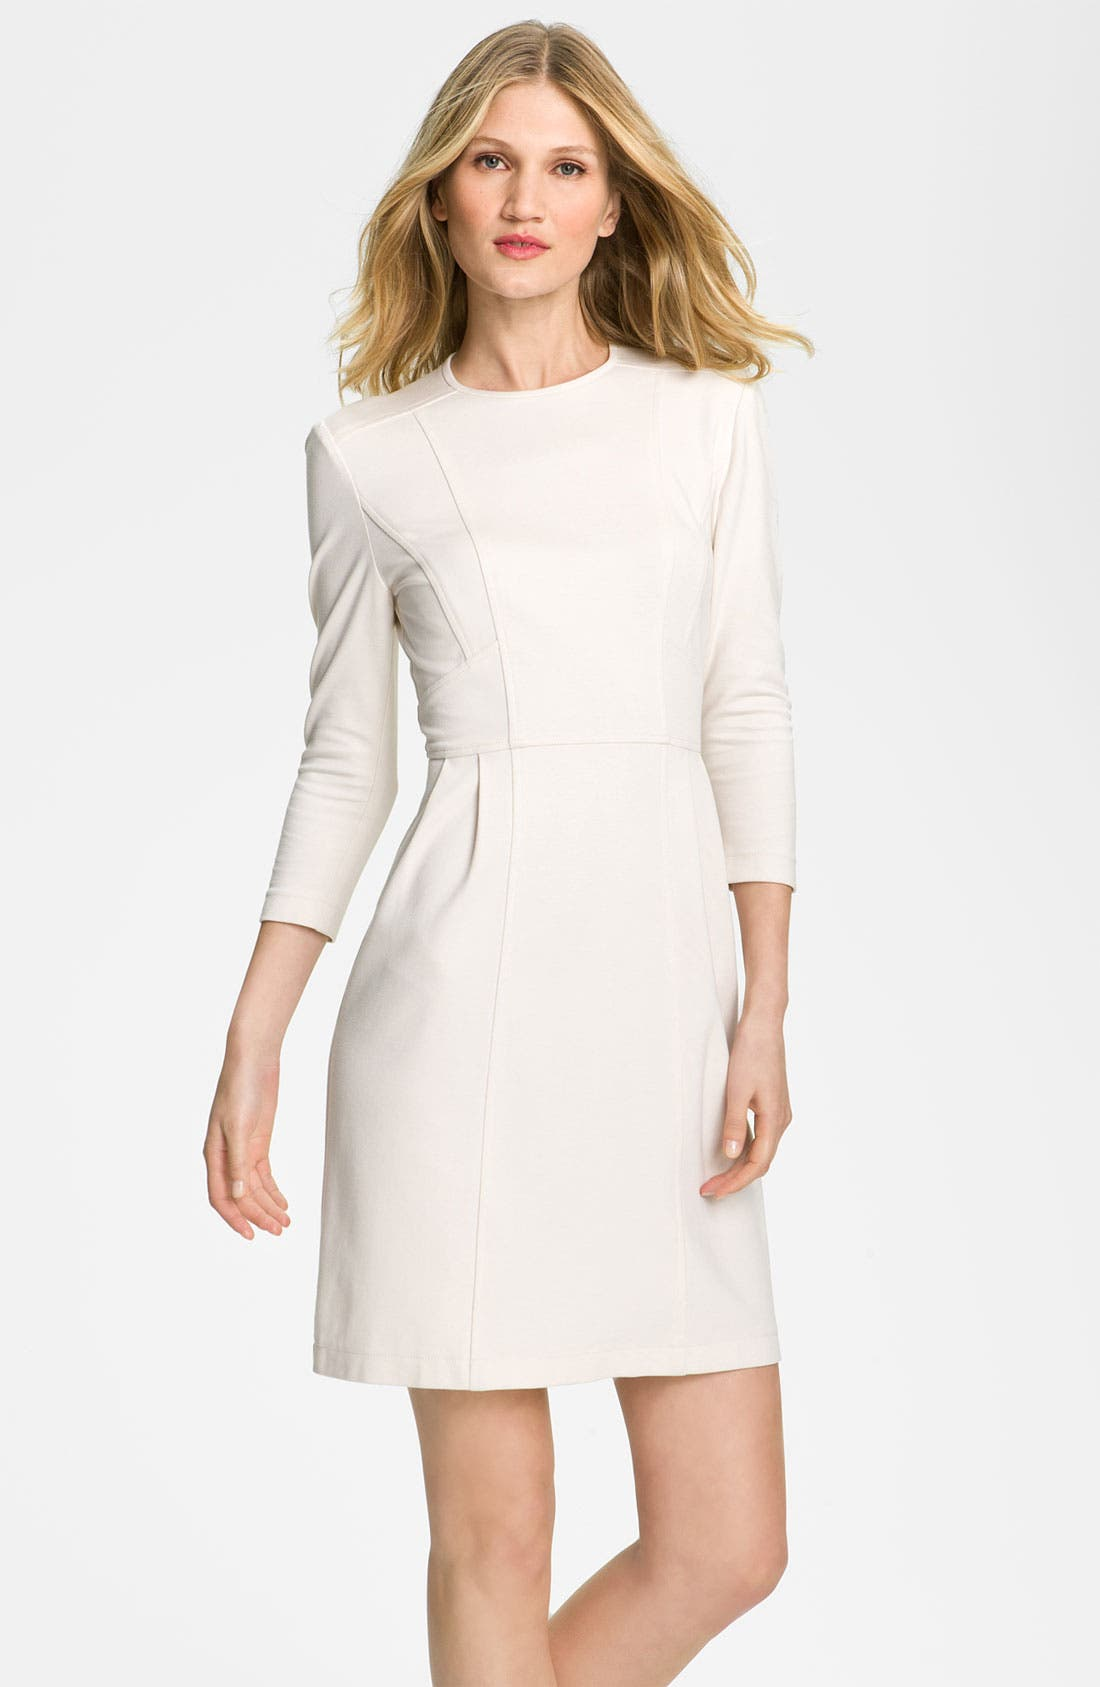 Alternate Image 1 Selected - Nanette Lepore 'Vale' Sheath Dress